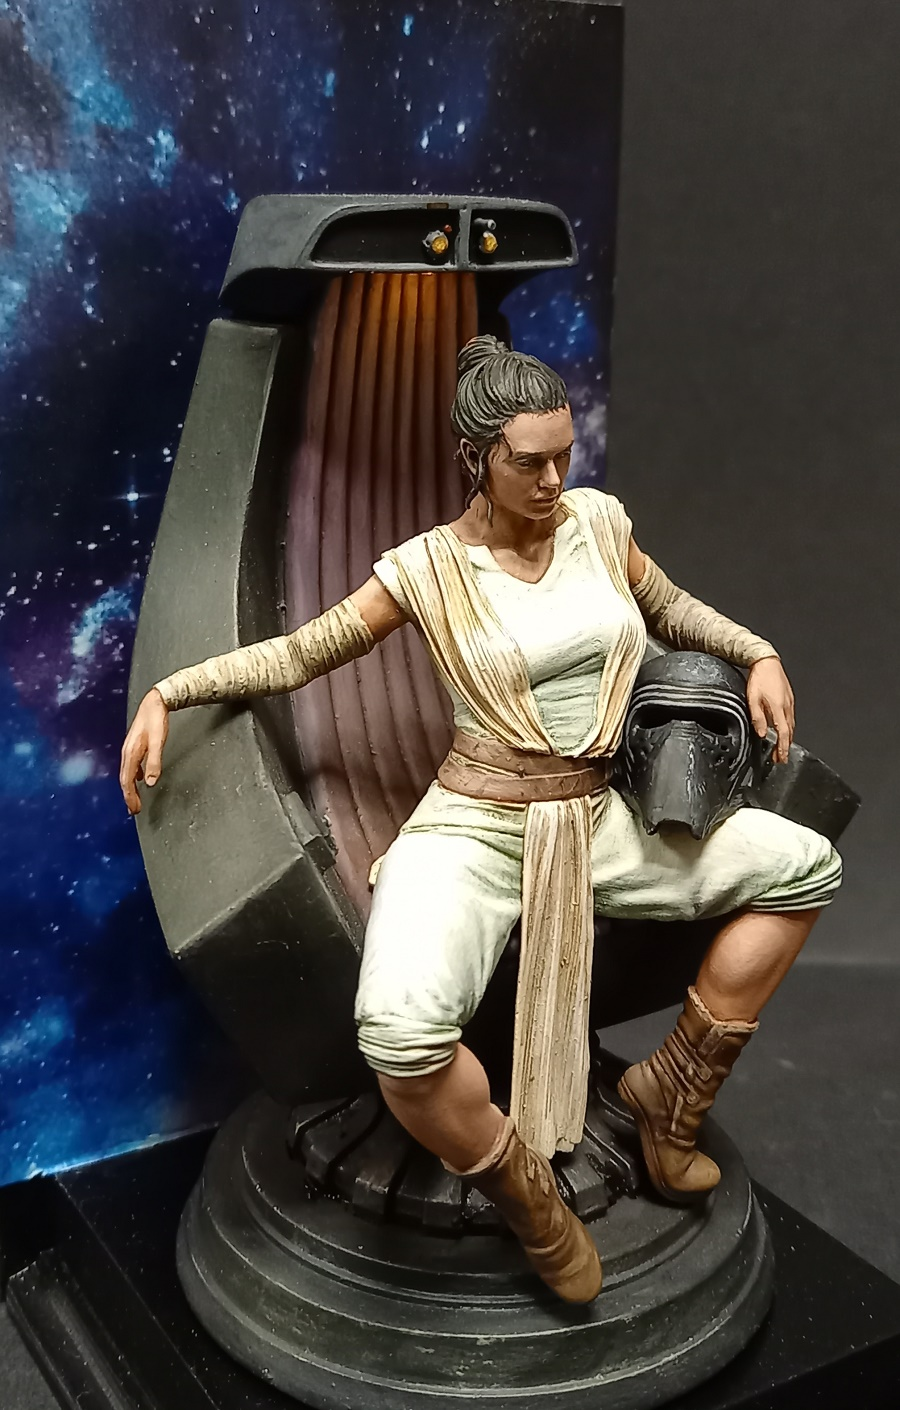 Rey Skywalker terminée - Page 2 Rey_2010